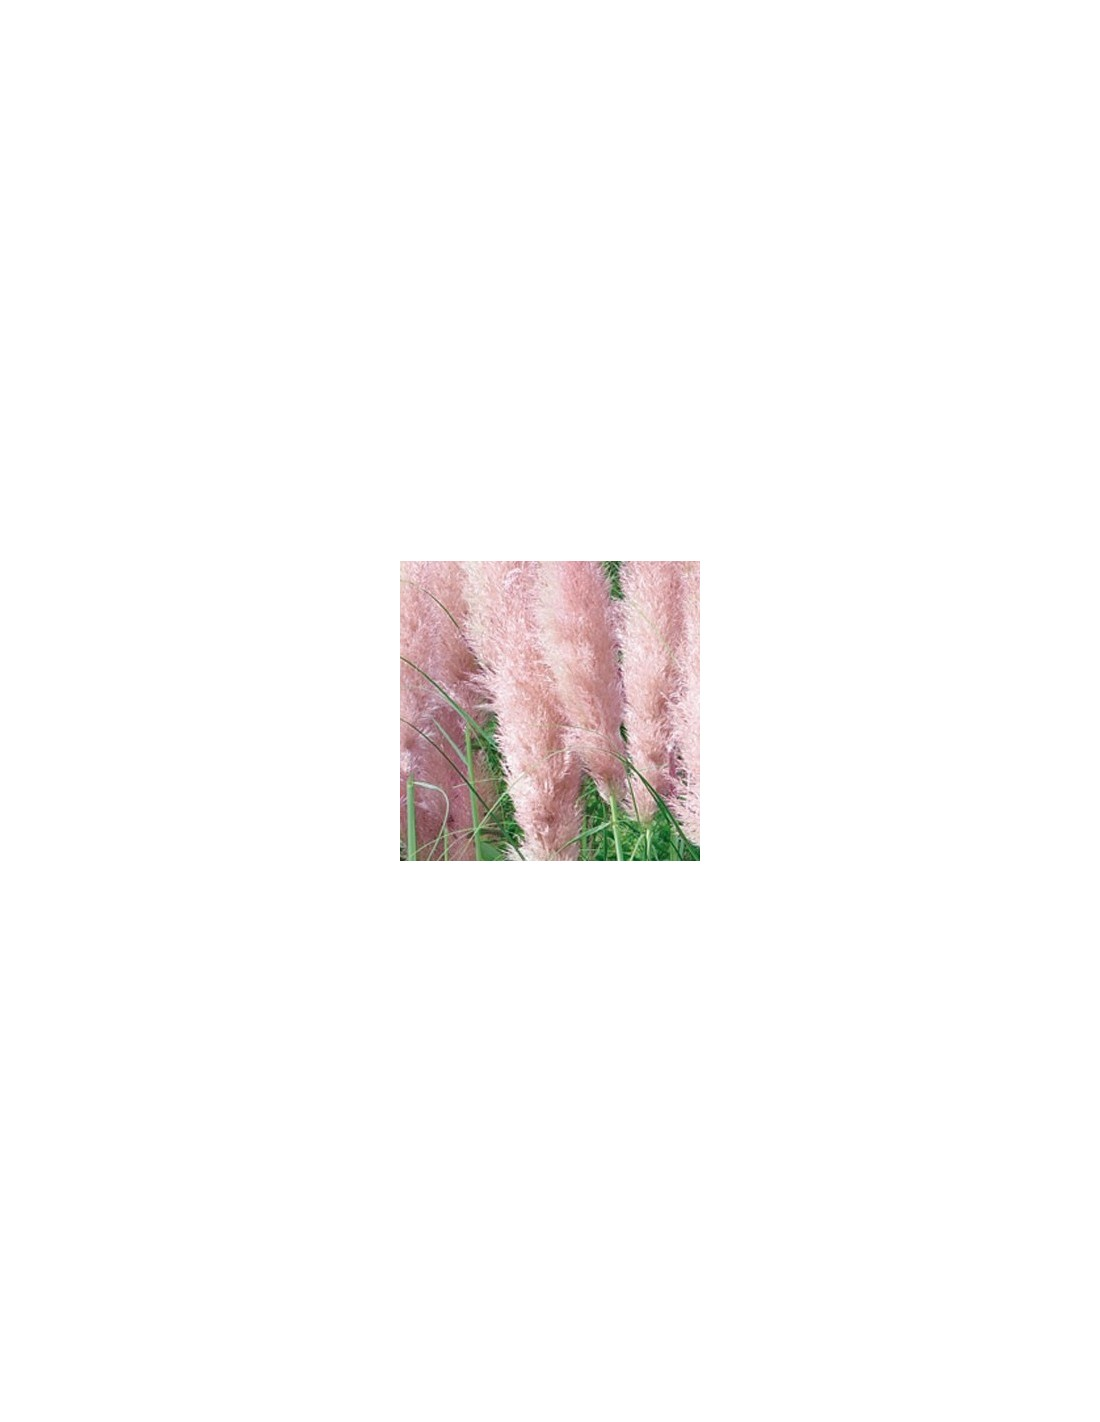 Herbe de la pampa rose les jardins d 39 hauti re - Herbe de la pampa prix ...